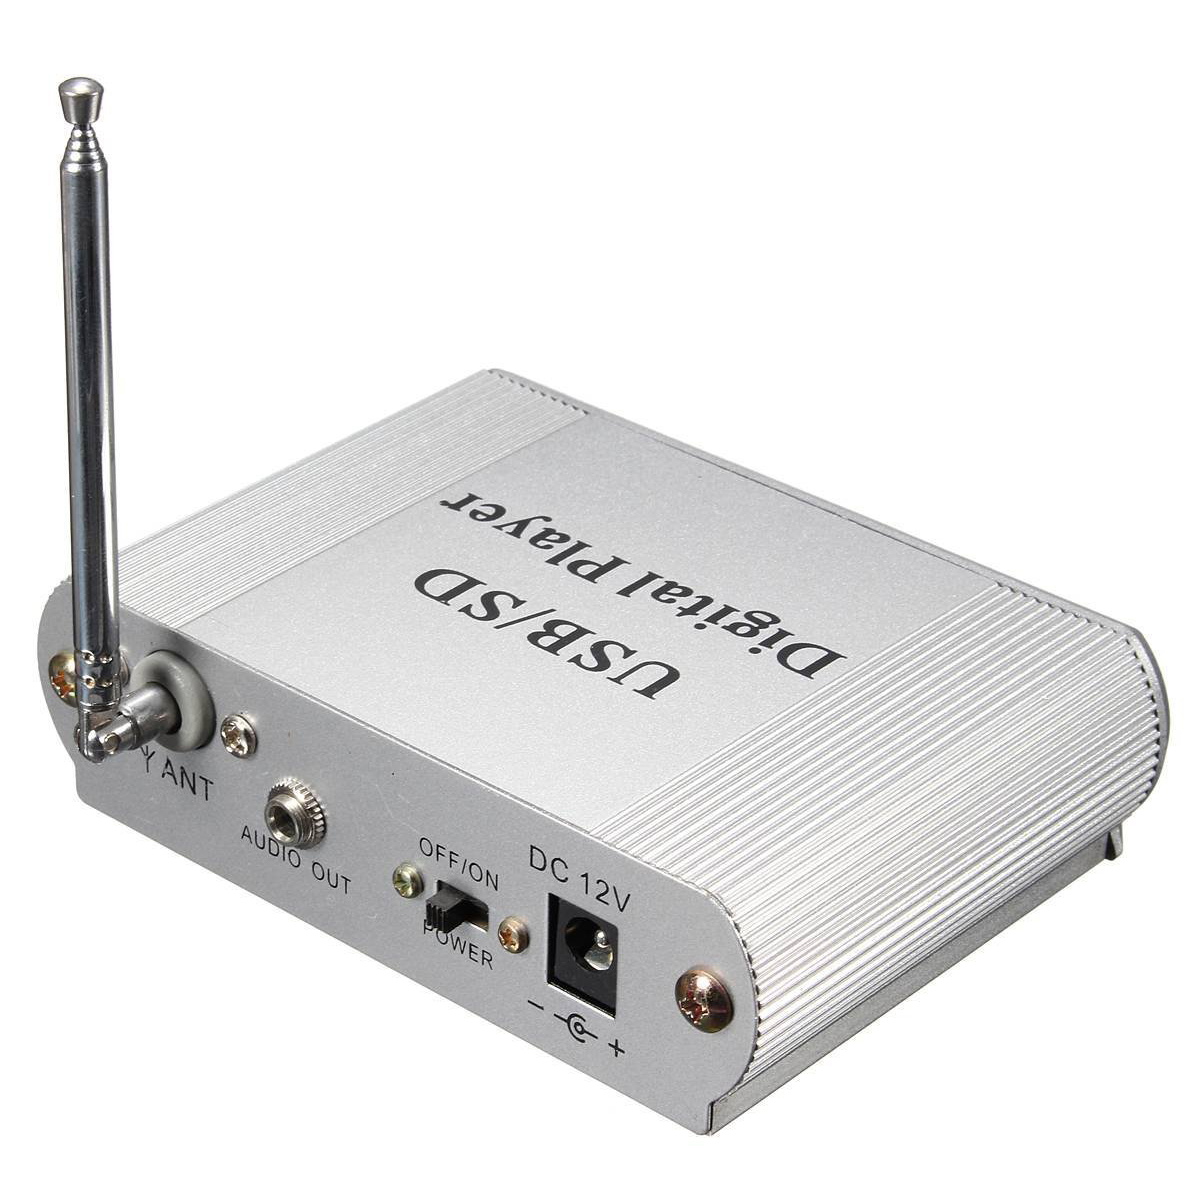 Full-mini Car Car Usb Digital Led Sd Audio Amplifier Amplifier Mp3 Decoder Sd / Mmc Card U Stick Fm Radio Player Remote With R